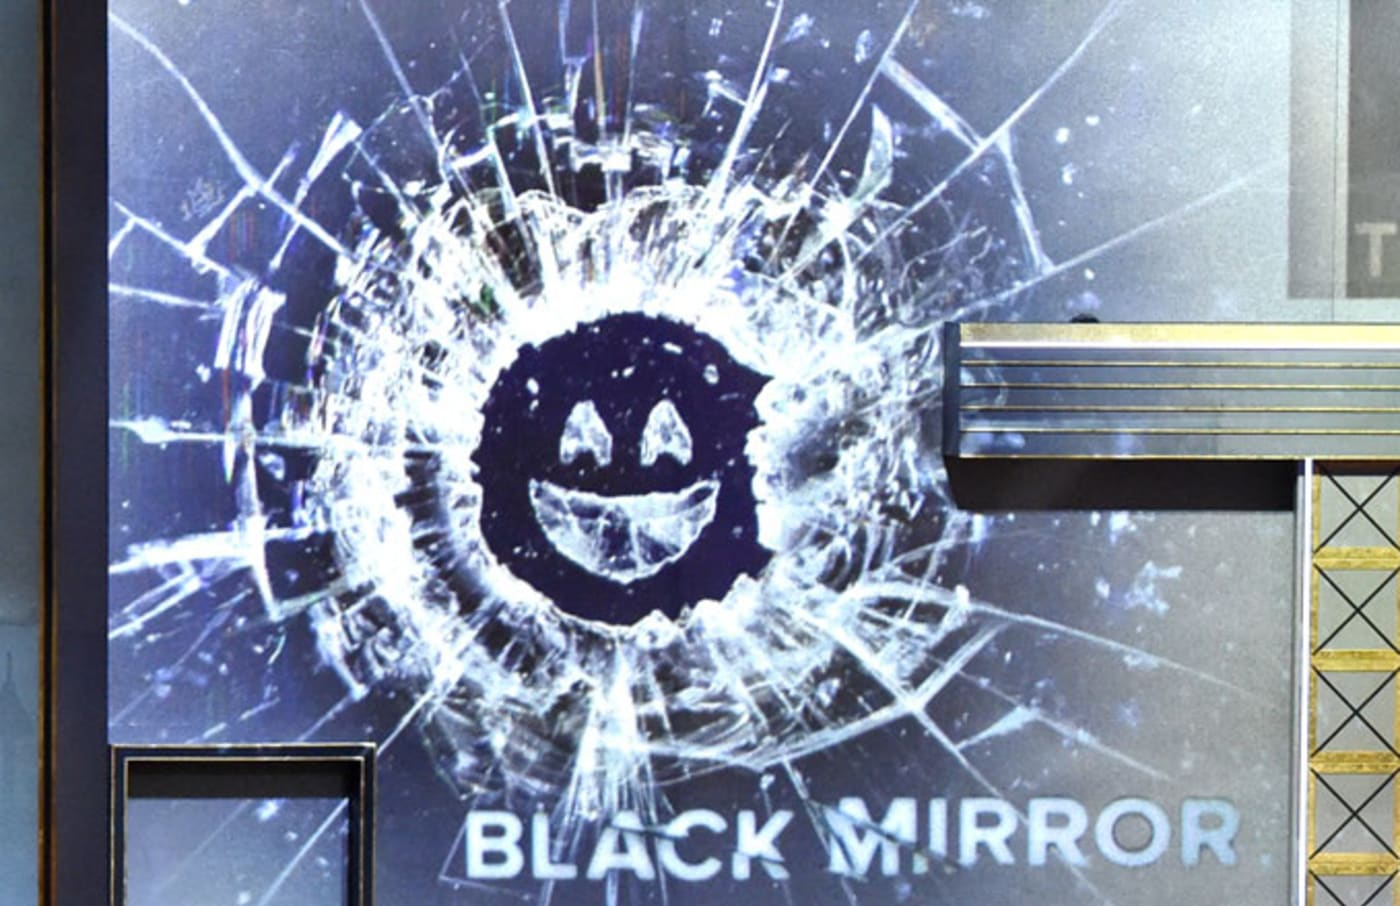 Black Mirror wins an Emmy